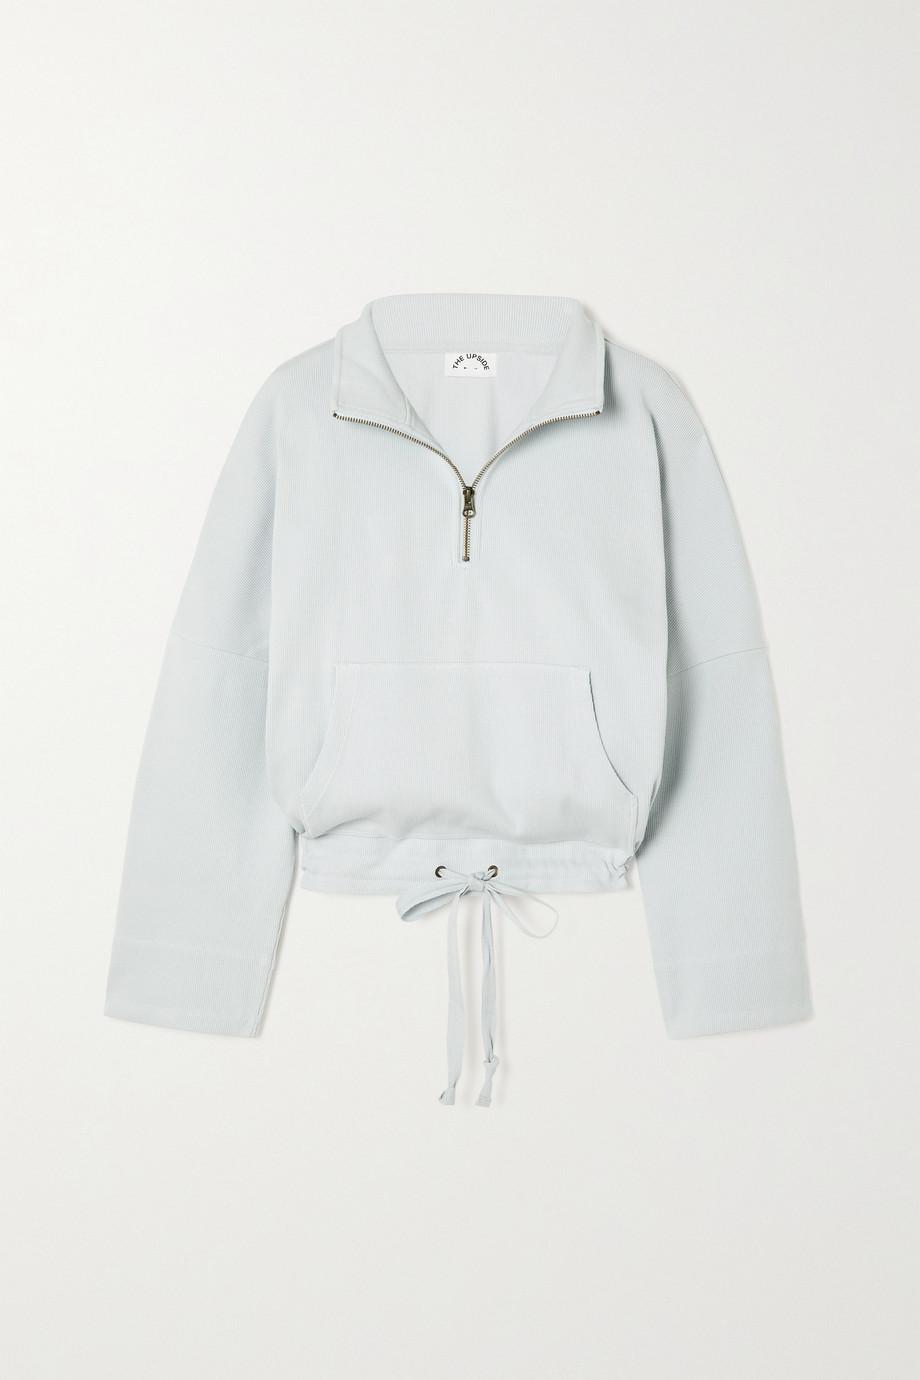 The Upside Ezi Tiena ribbed cotton-blend jersey sweatshirt